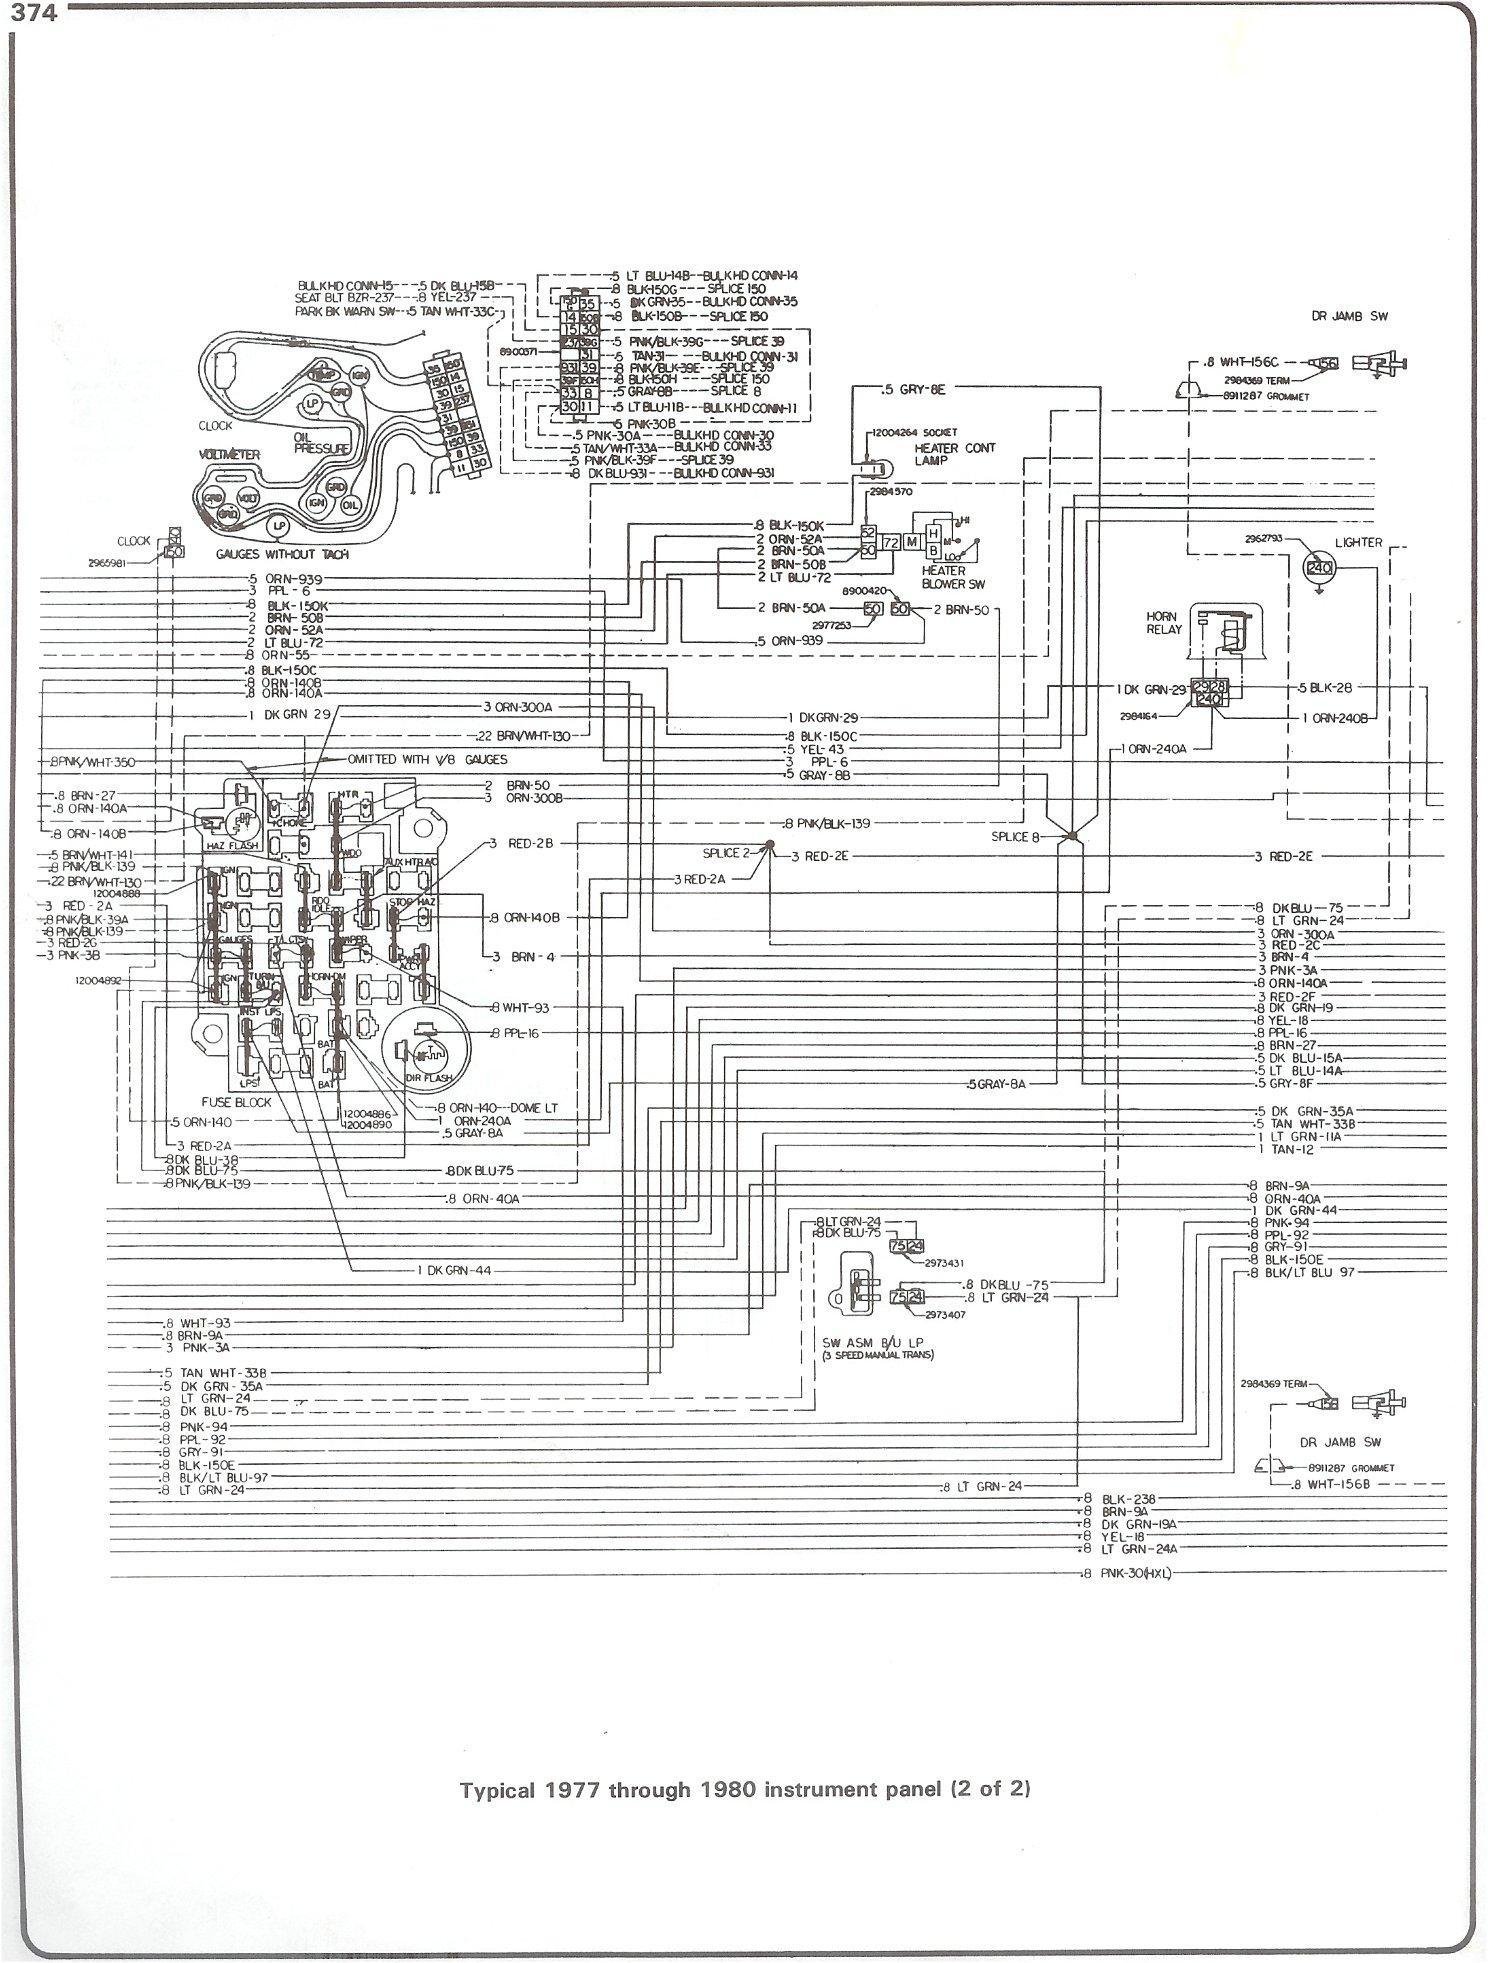 78 Gmc Wiring Diagram - Wiring Diagram Data Oreo - 1978 Chevy Truck Wiring Diagram